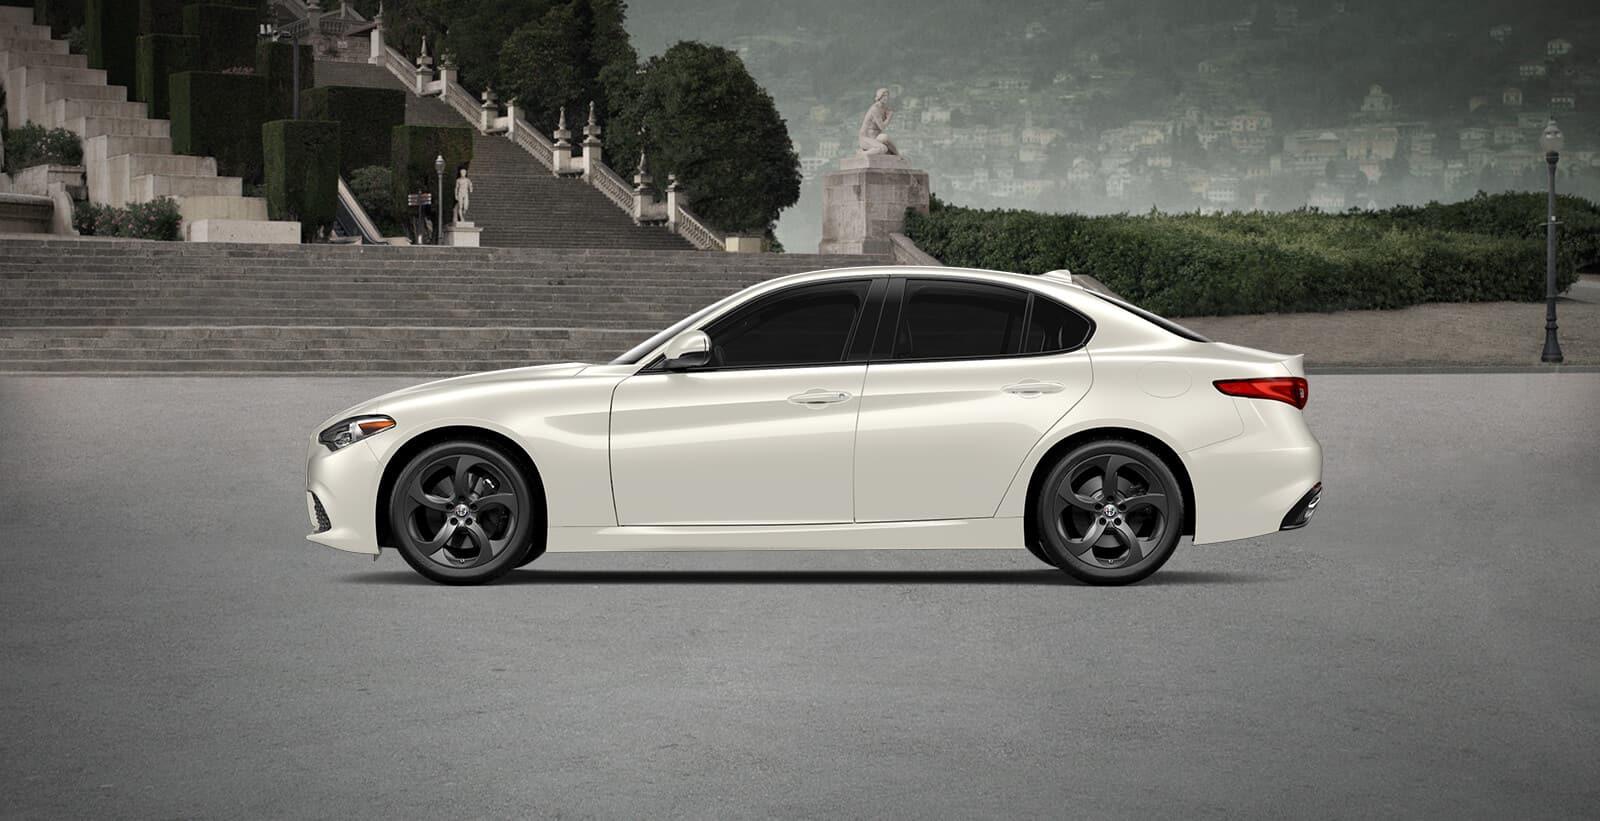 Alfa Romeo Giulia | 2019 2020 Car Release Date